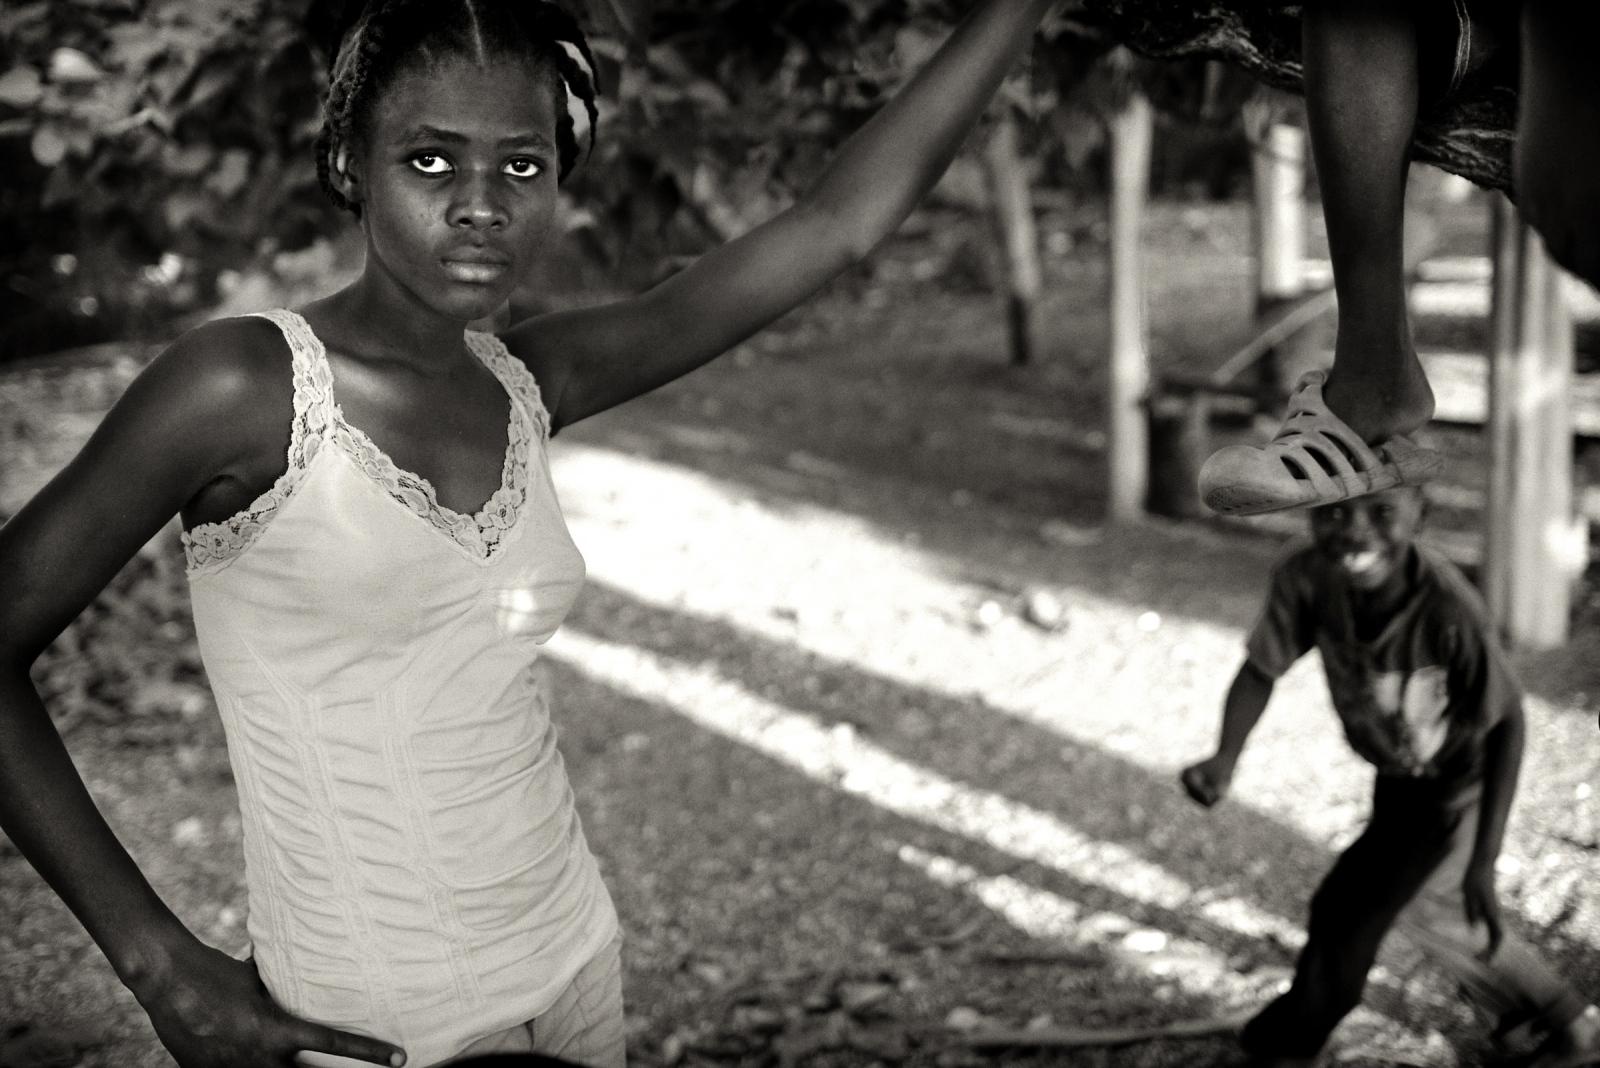 Art and Documentary Photography - Loading P1040035marie_s.jpg